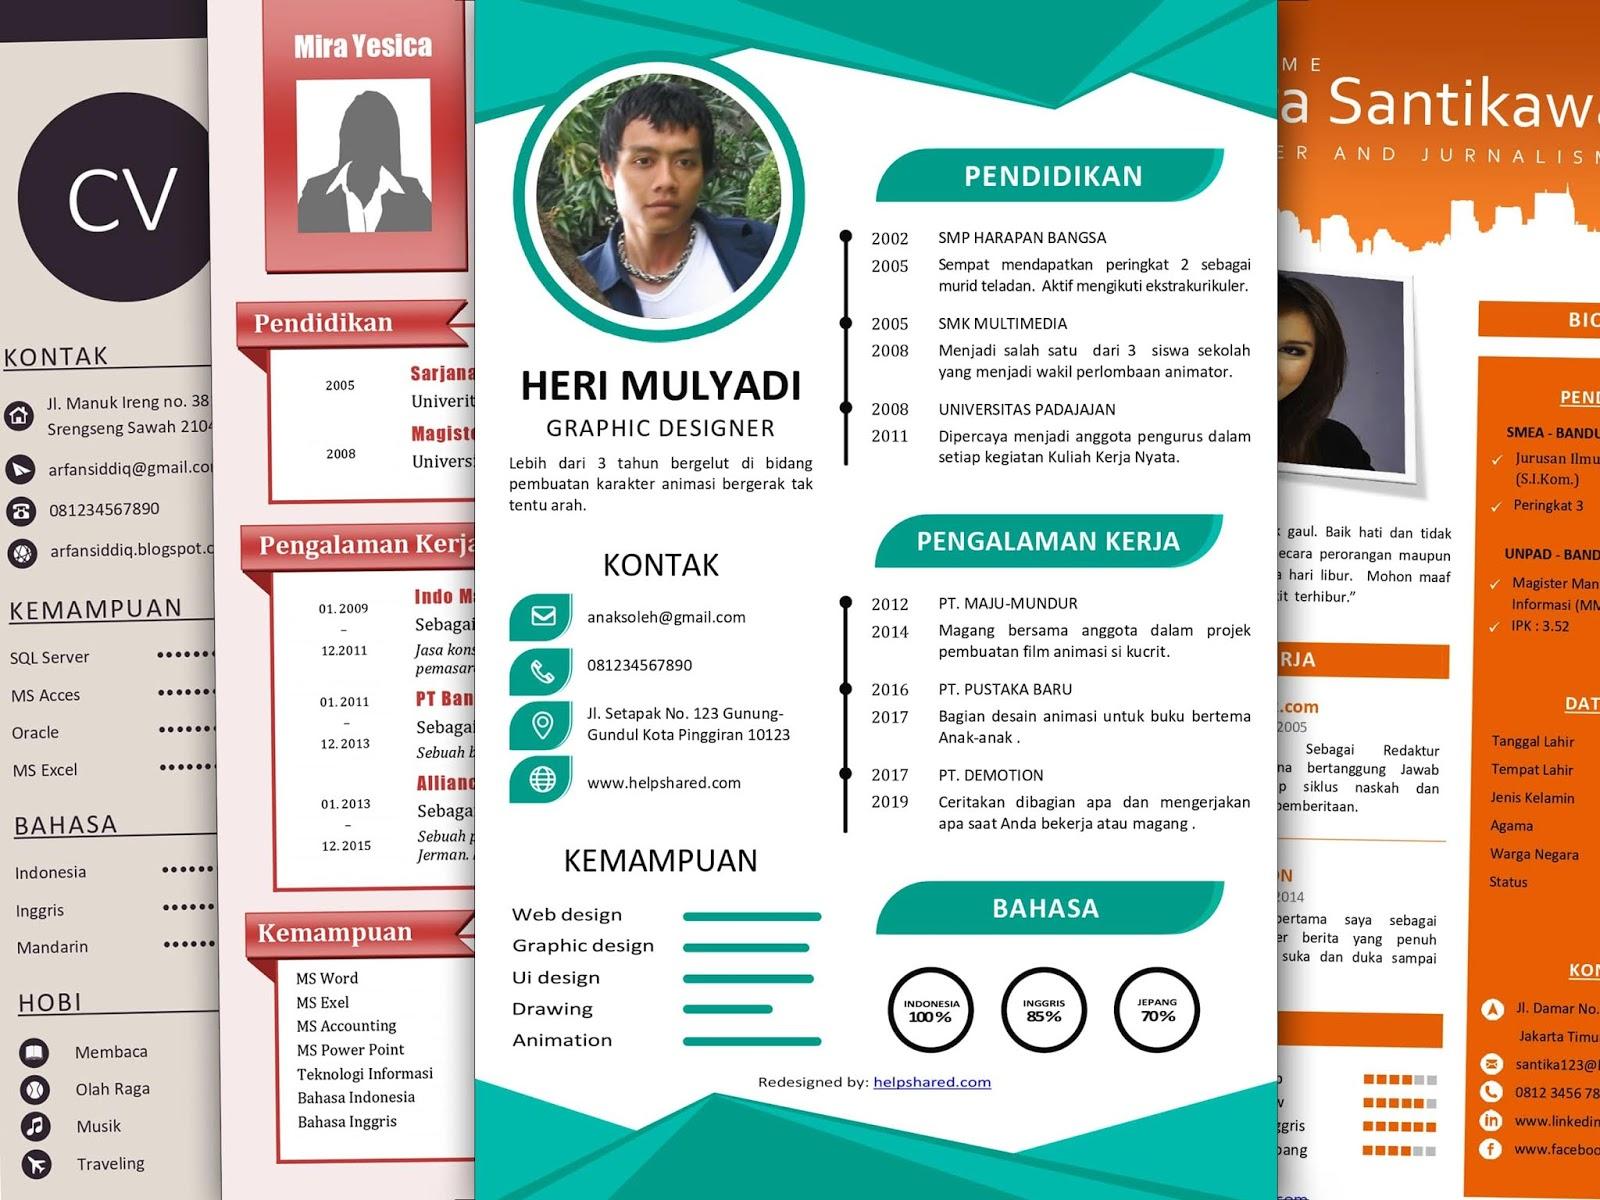 Cara Membuat CV yang Baik dan Benar